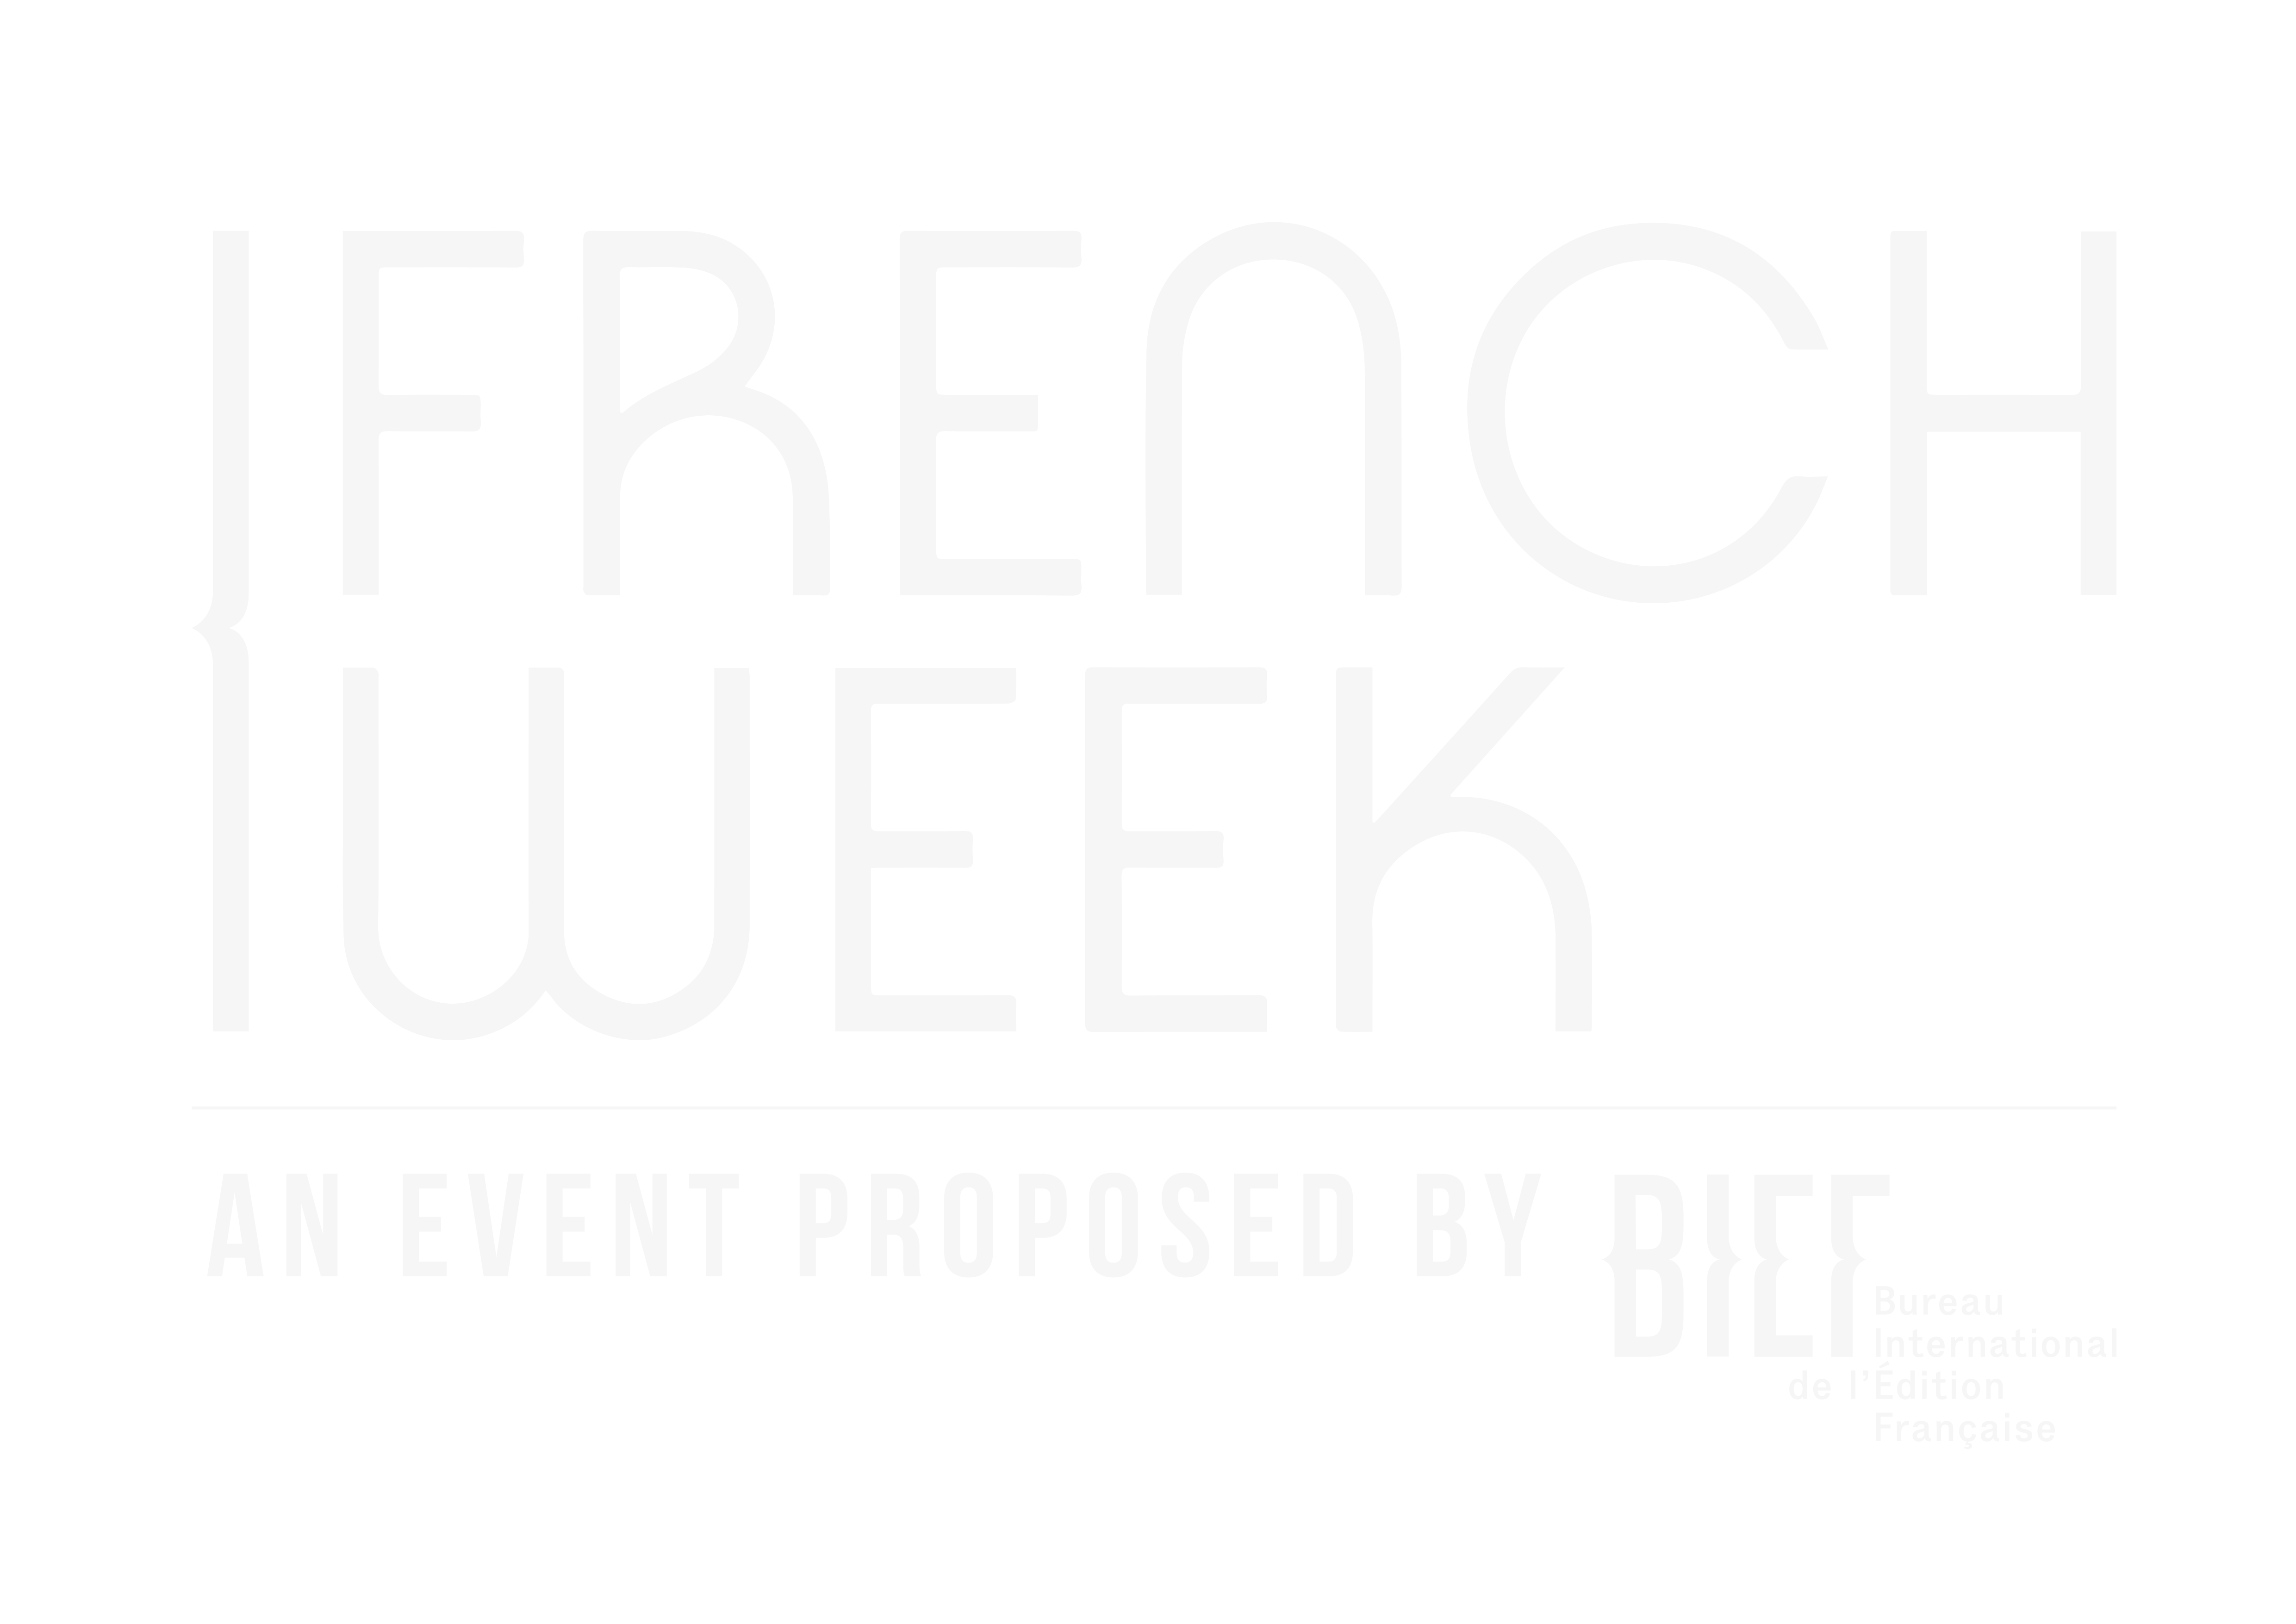 FRENCH WEEK, by BIEF